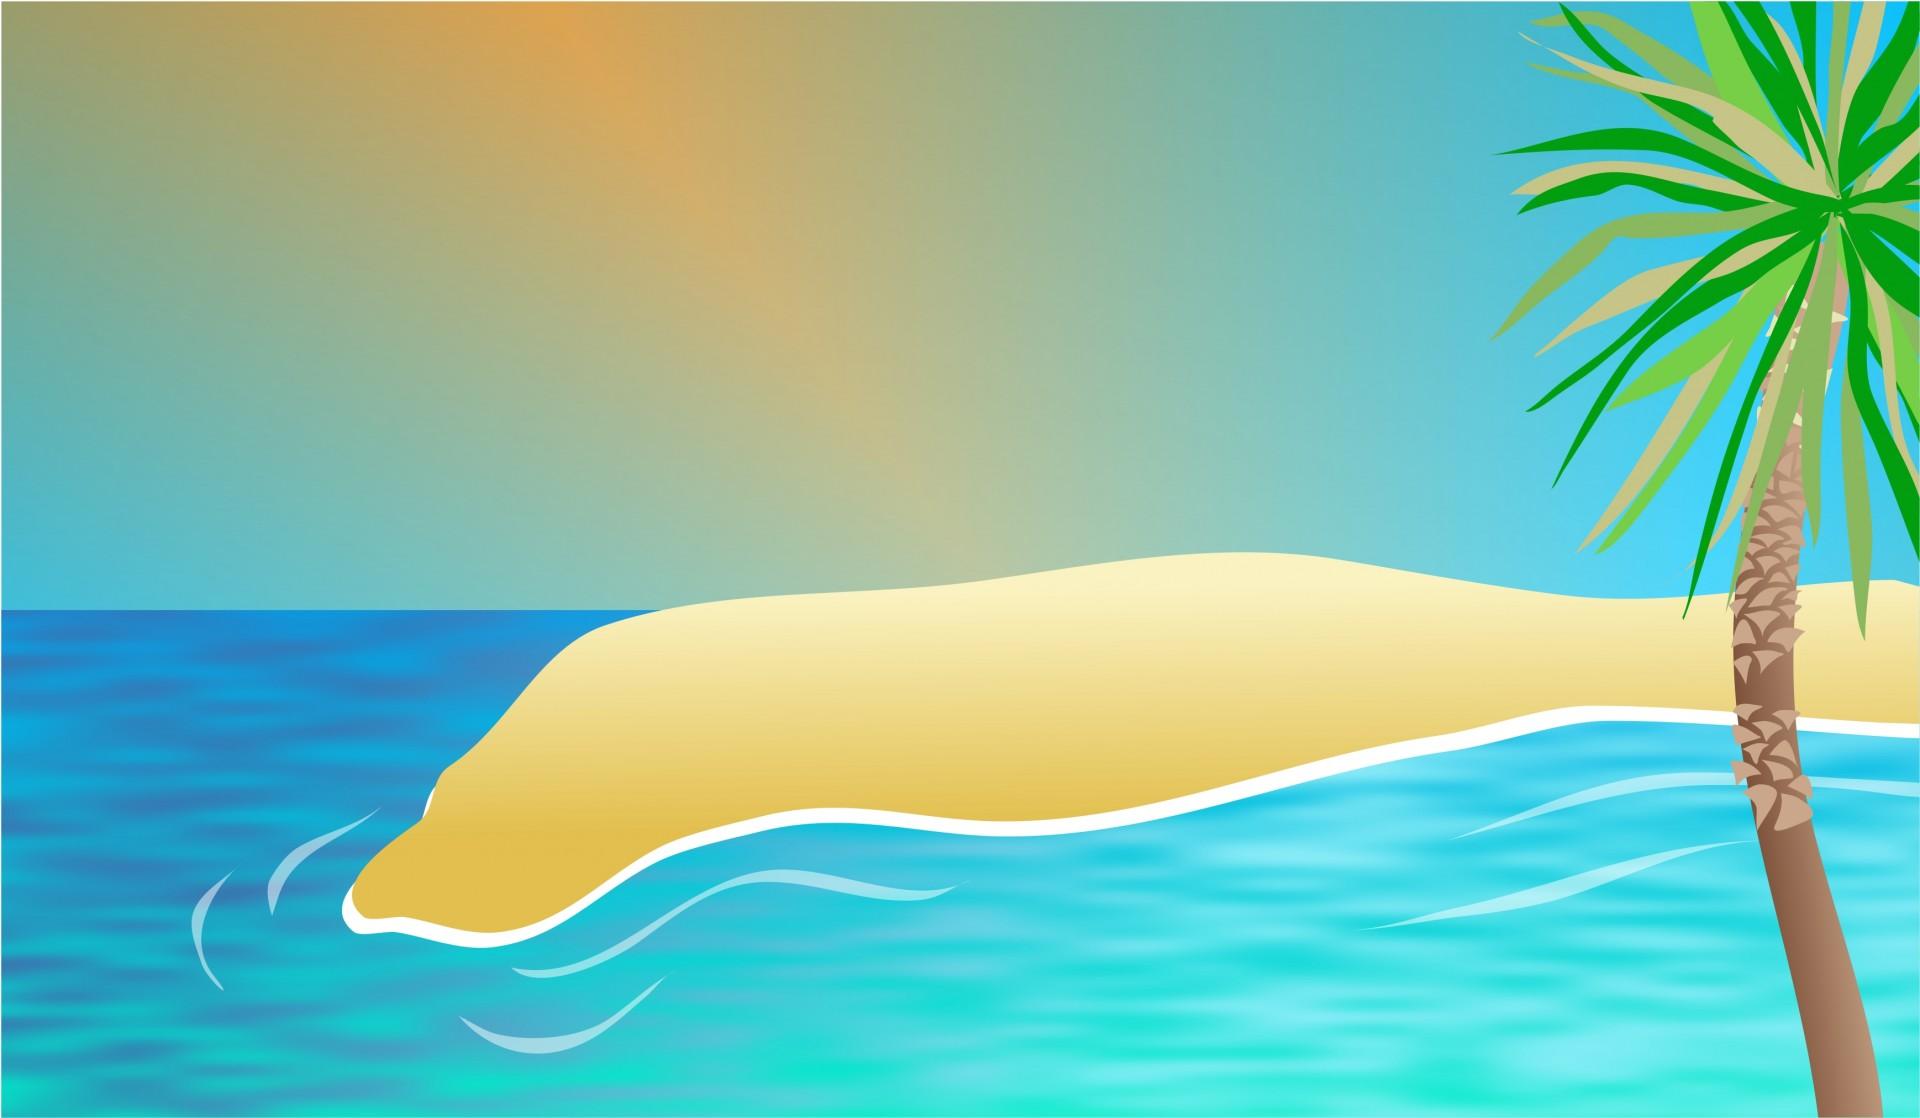 Clip art illustration graphic. Clipart ocean ocean scenery